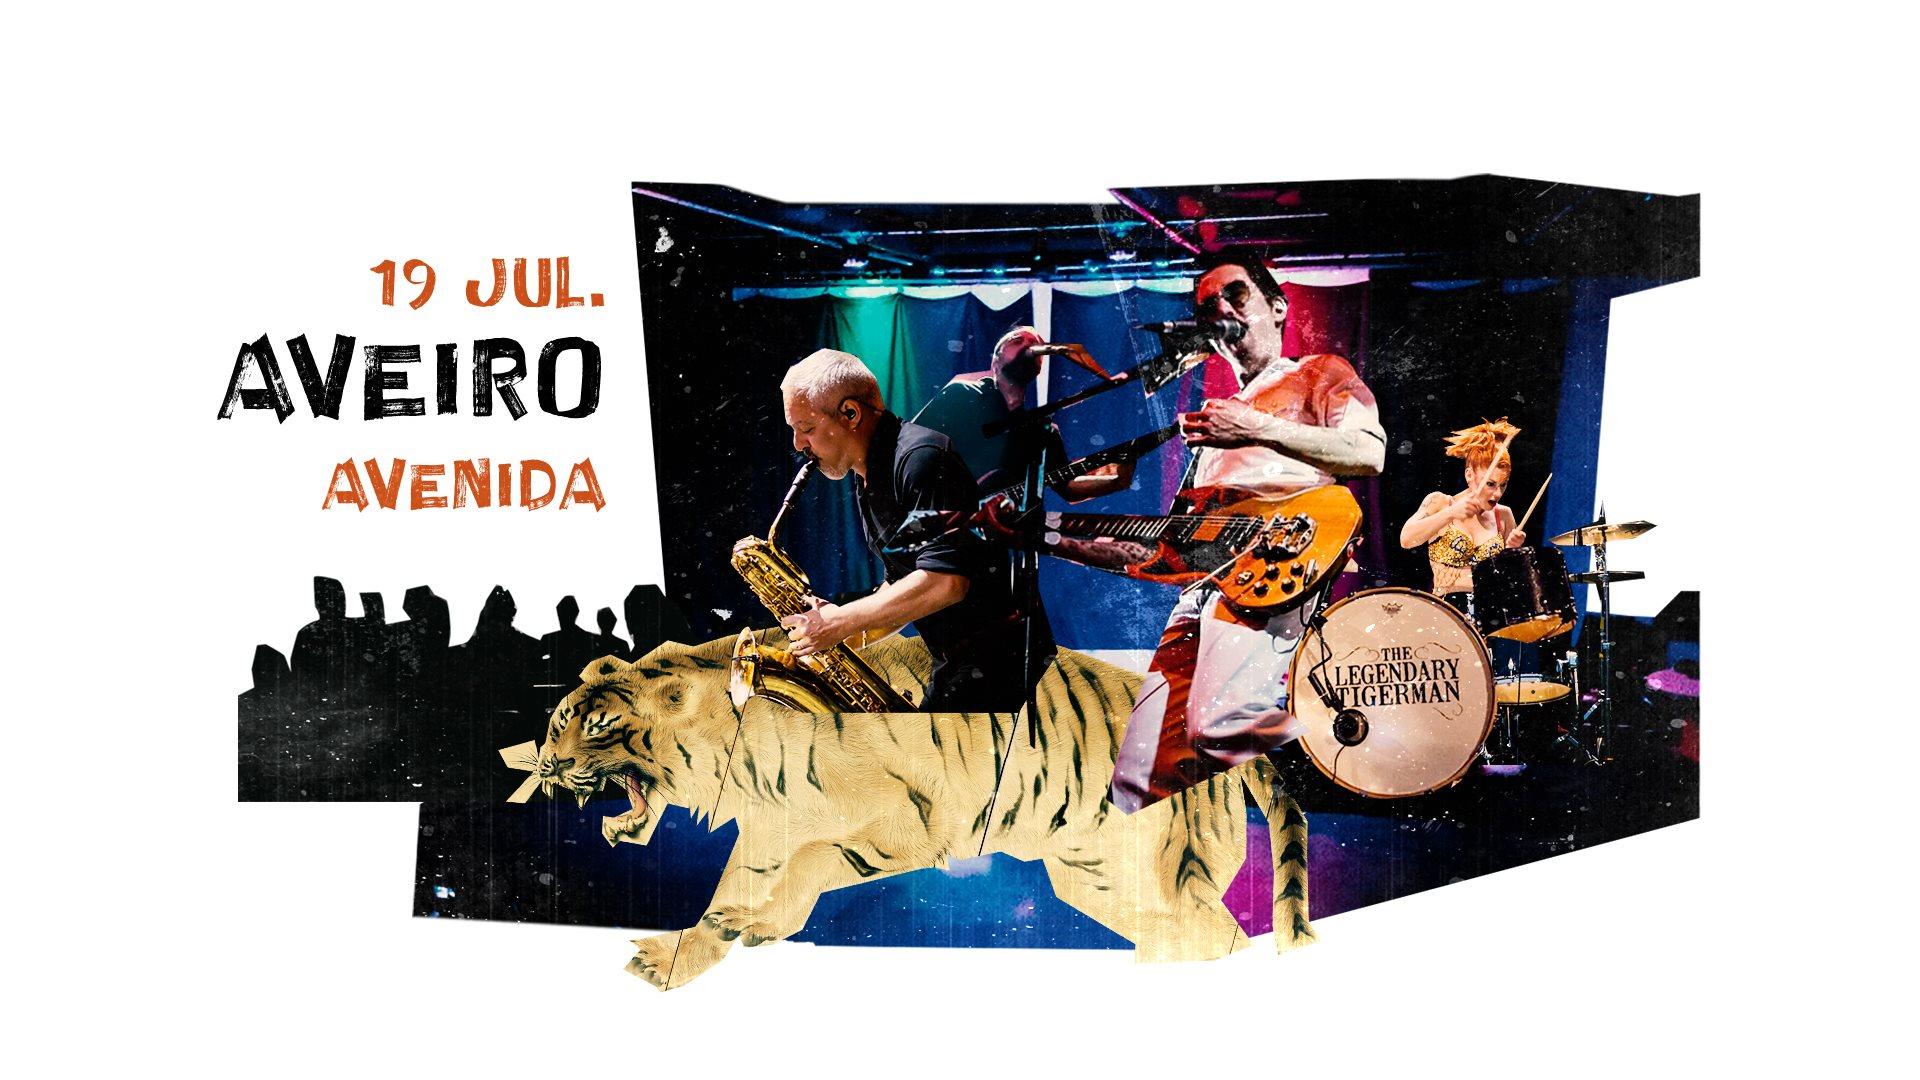 The Legendary Tigerman | Avenida CC (Aveiro)